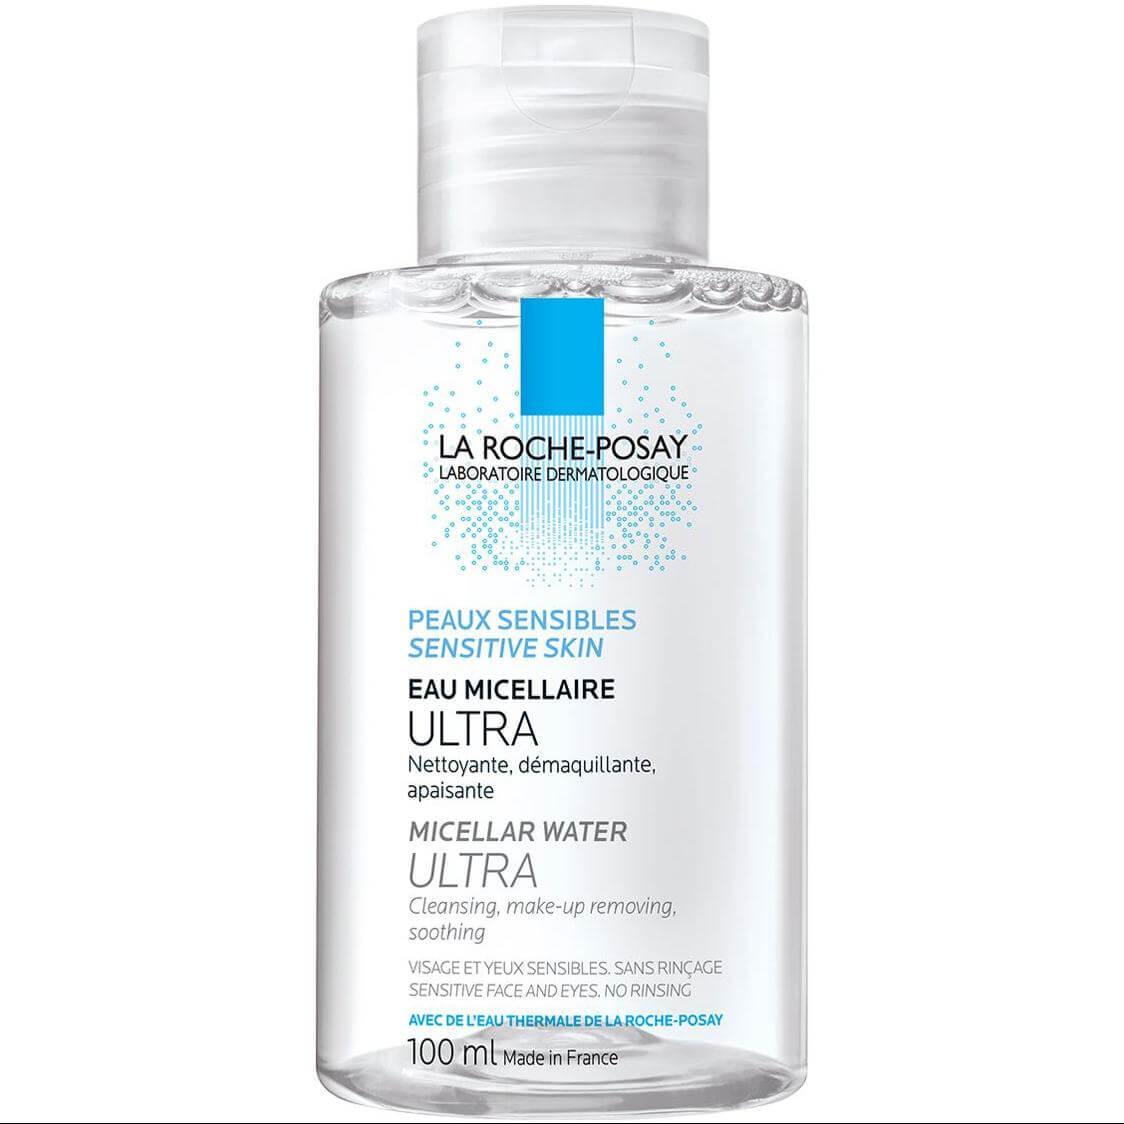 La Roche-Posay Micellar Water Ultra Sensitive Skin Απαλό Νερό Καθαρισμού Προσώπου & Ματιών για Ευαίσθητο Δέρμα Travel Size 100ml